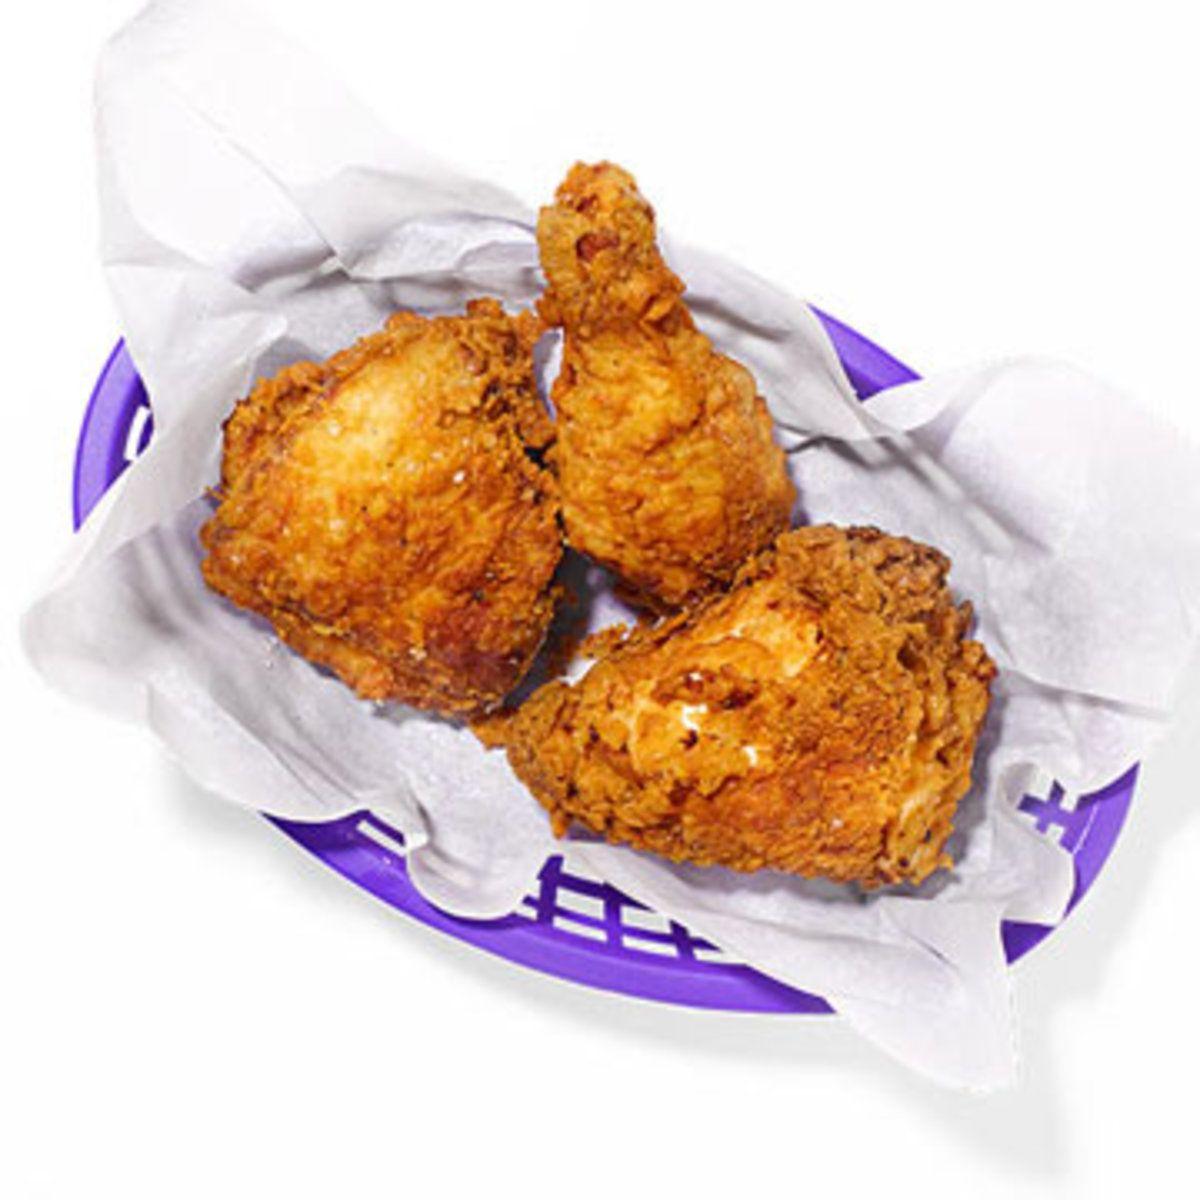 Classic Fried Chicken Recipe Fried Chicken Recipes Chicken Recipes Chicken